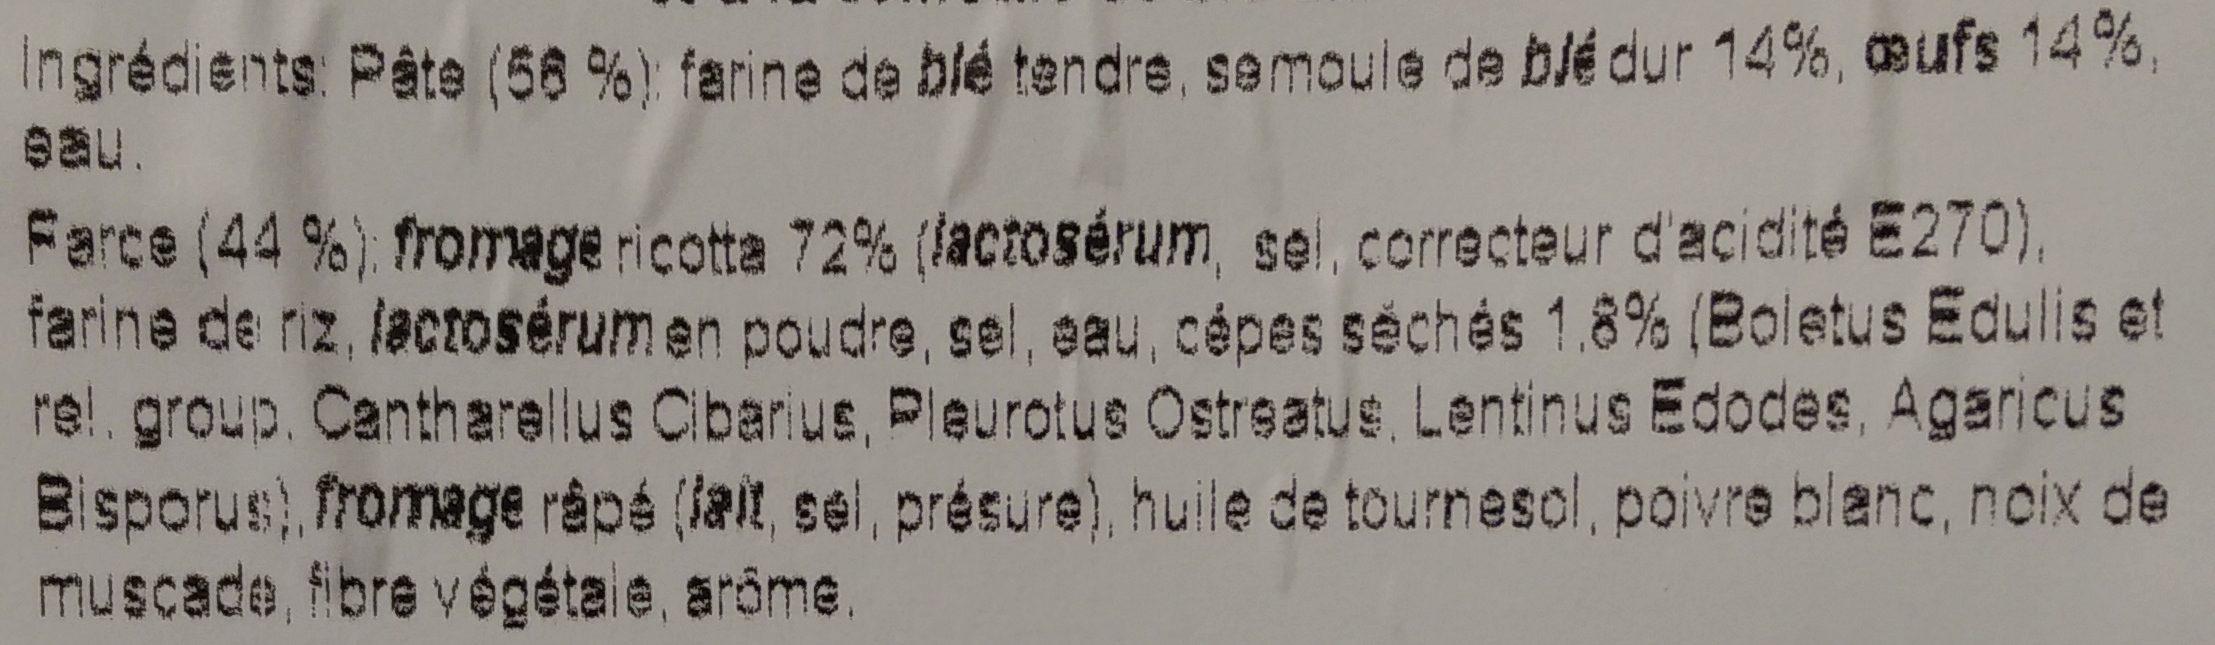 Mezzaluna Ricotta e Fungli Porcini - Ingrediënten - fr